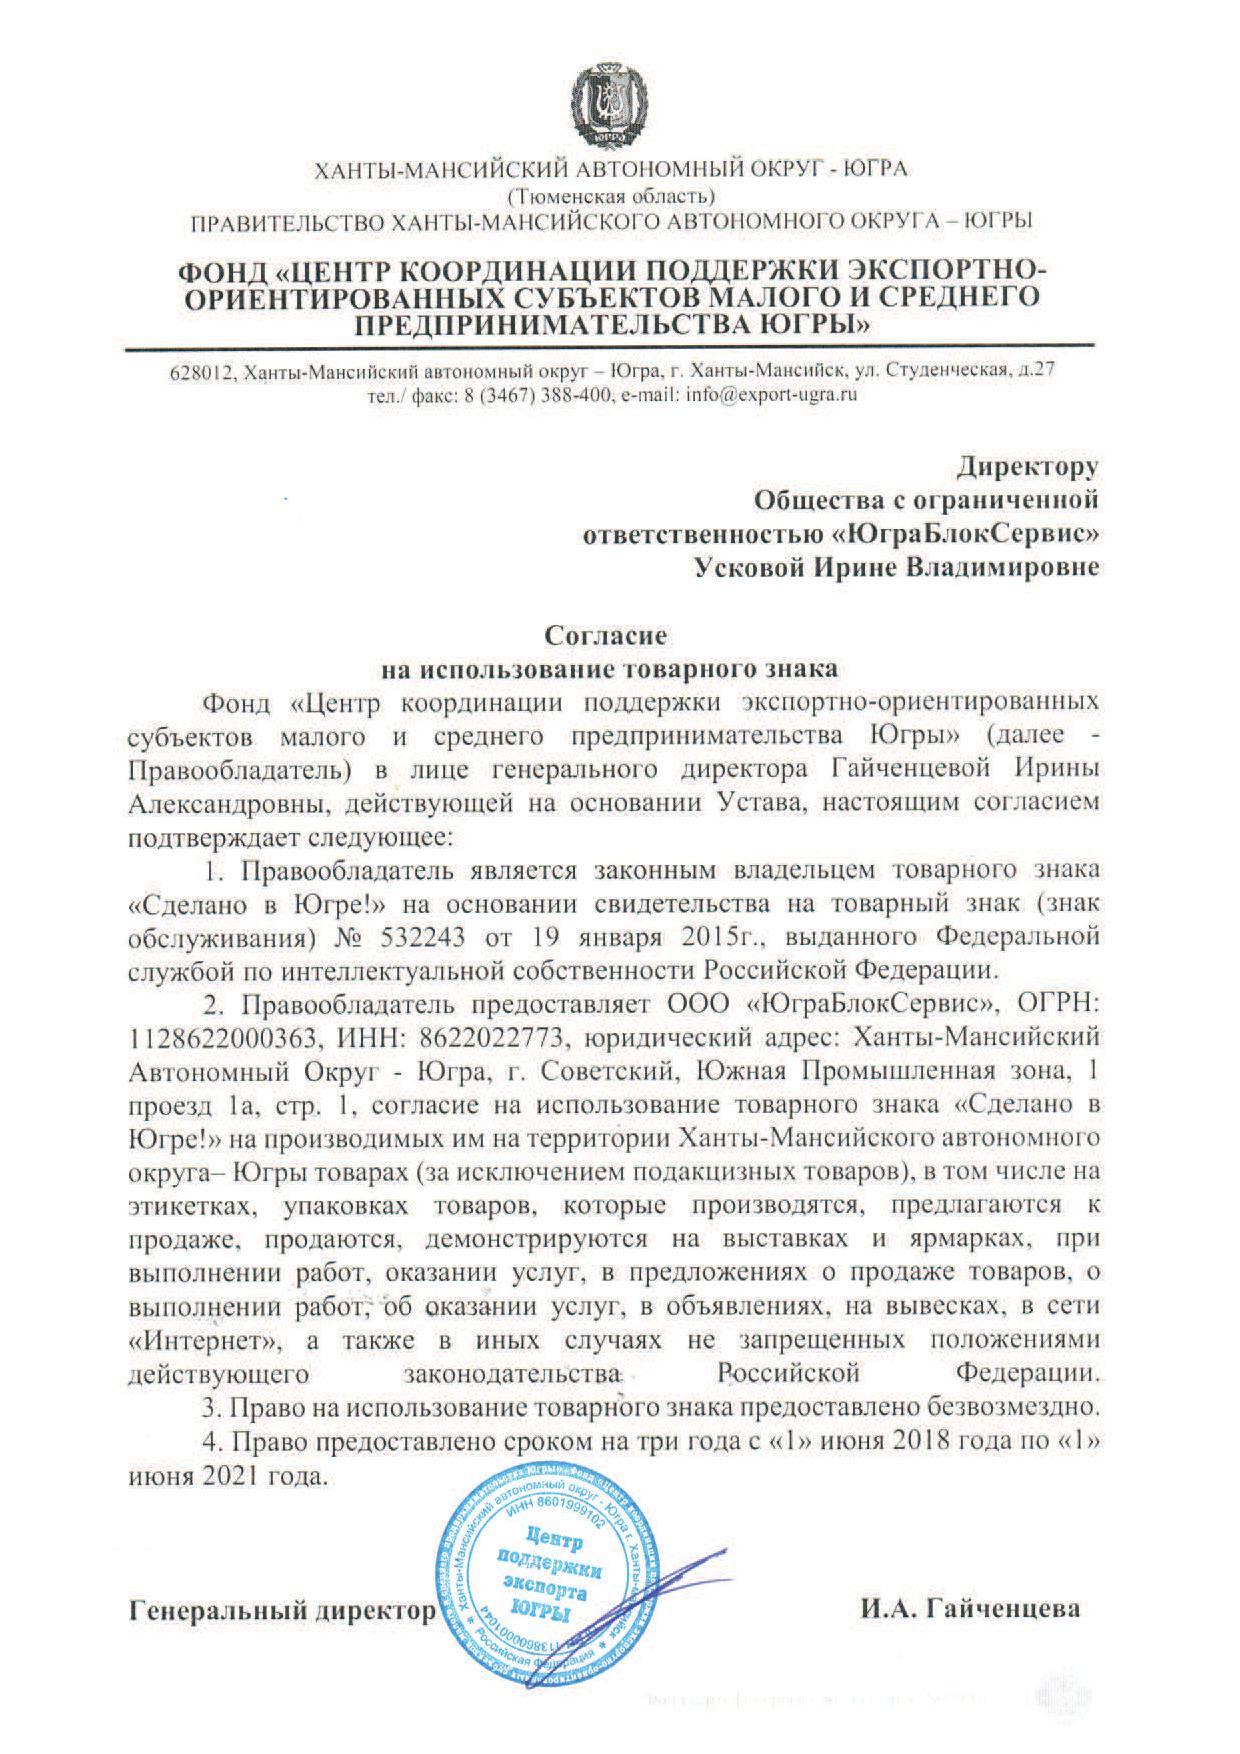 ООО ЮграБлокСервис